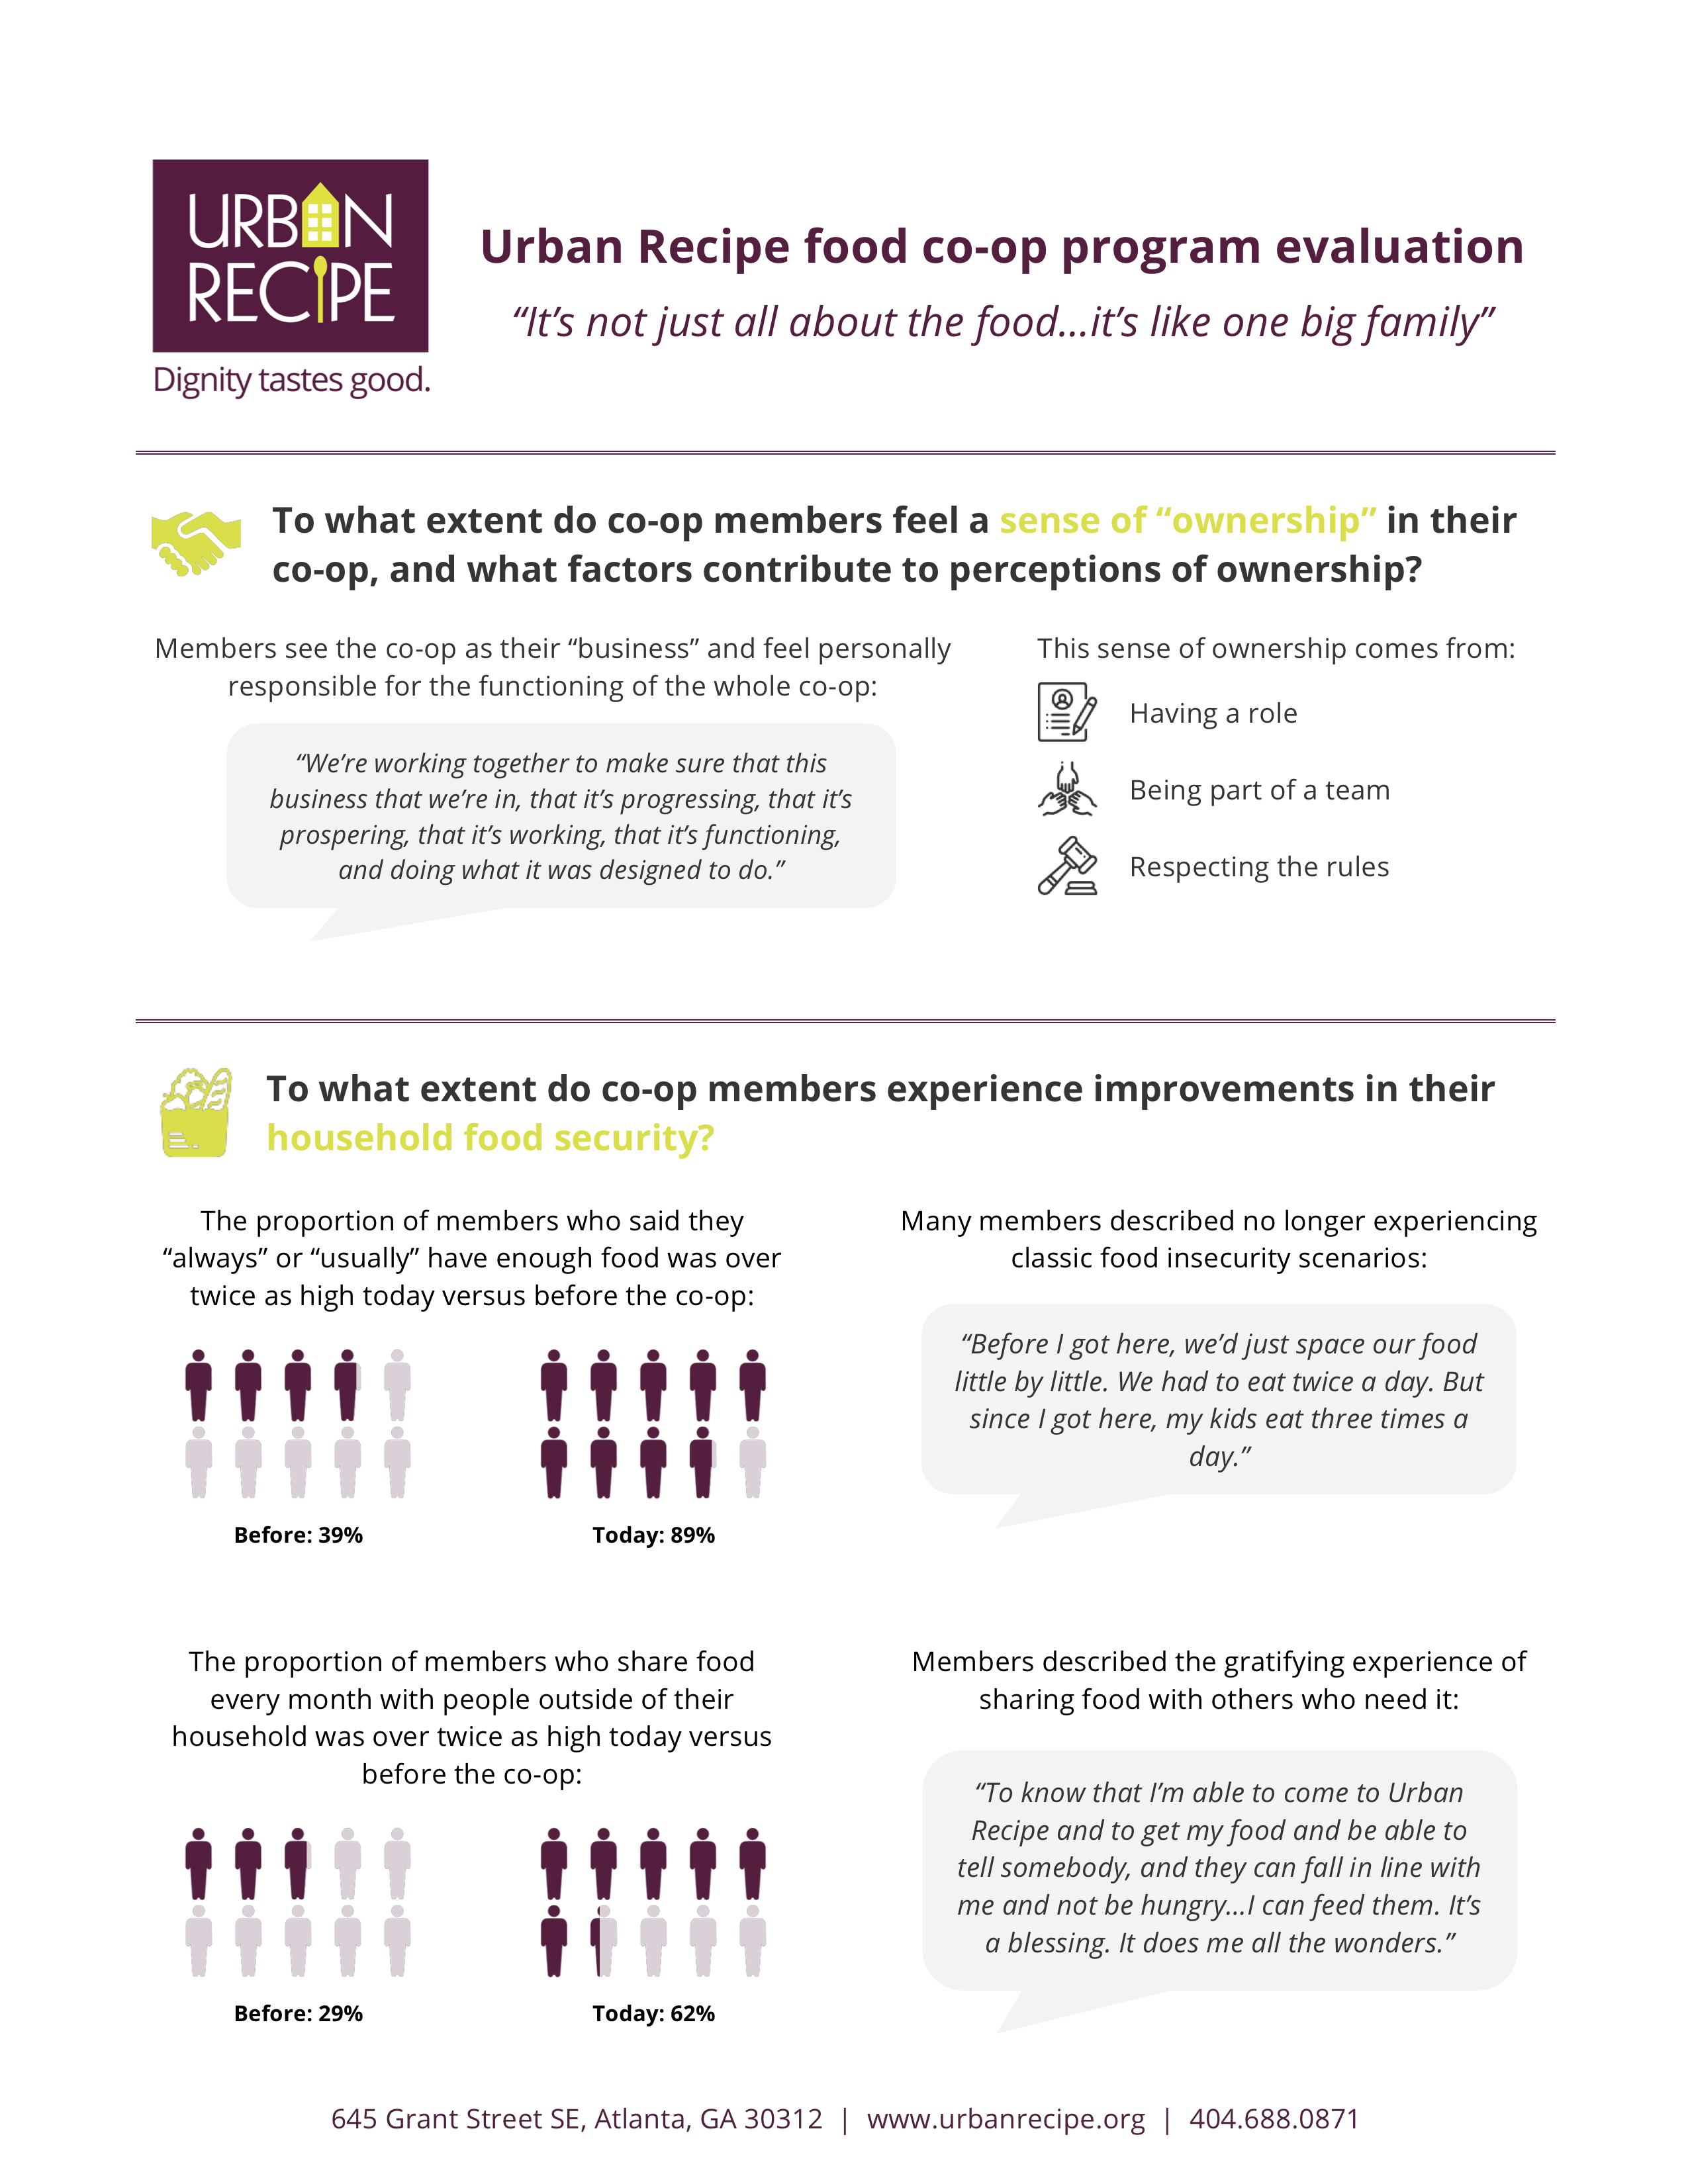 evaluation-infographic-p1